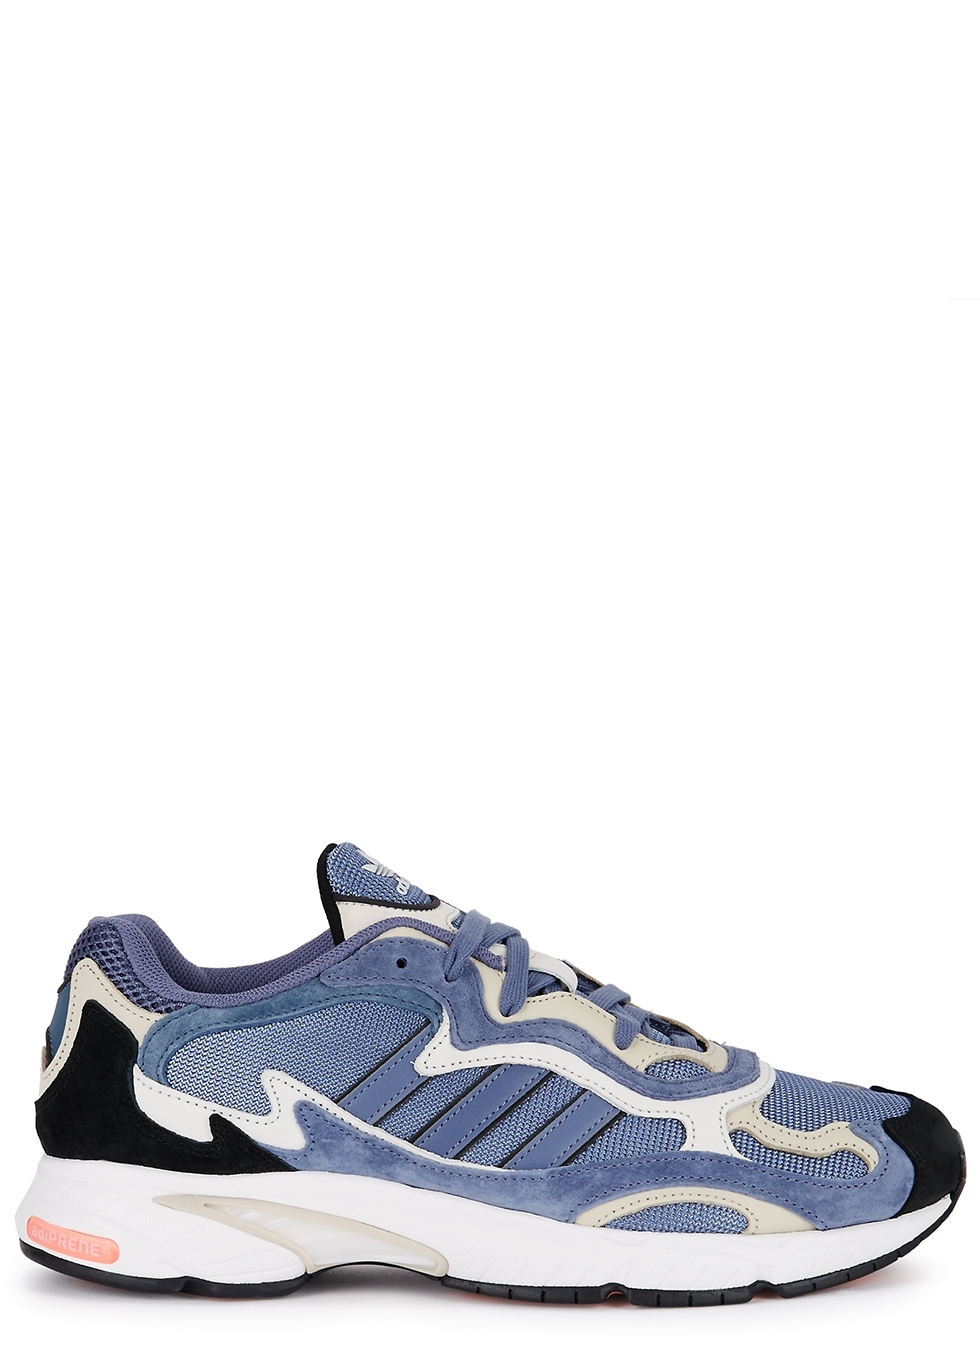 468095f92d4e Men s Designer Shoes - Men s Footwear - Harvey Nichols